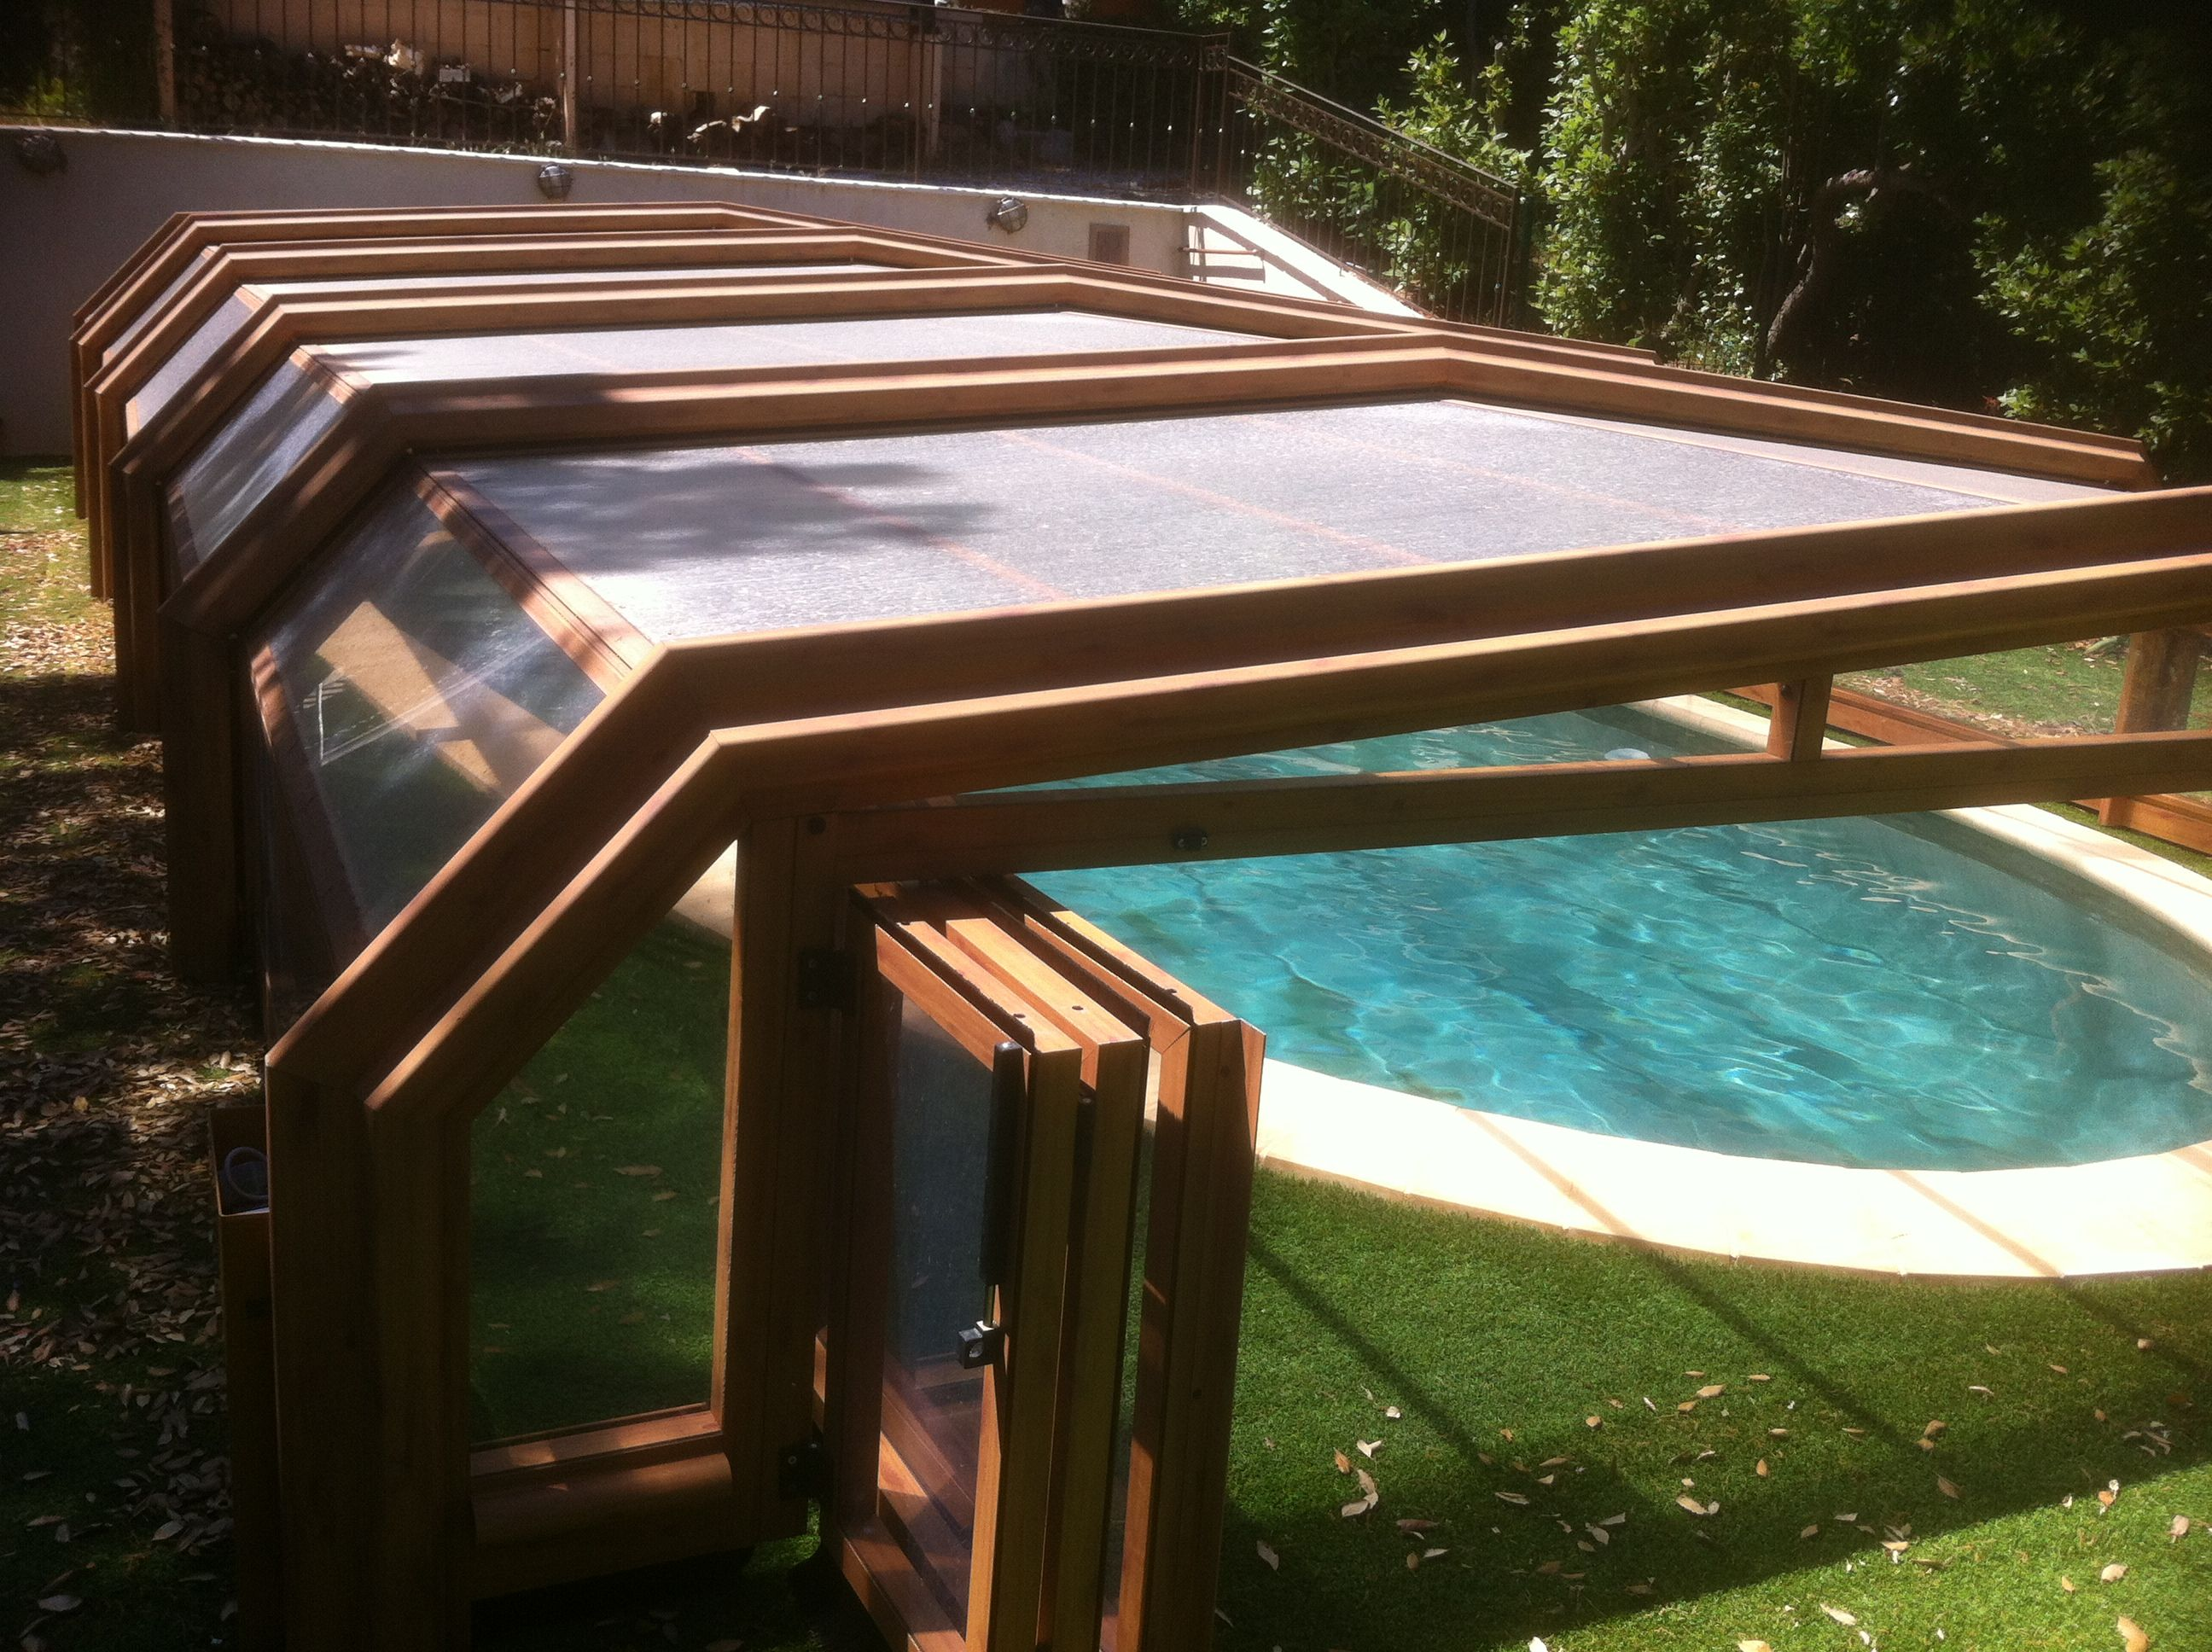 entretien abri de piscines atlantika et motorisation serem. Black Bedroom Furniture Sets. Home Design Ideas